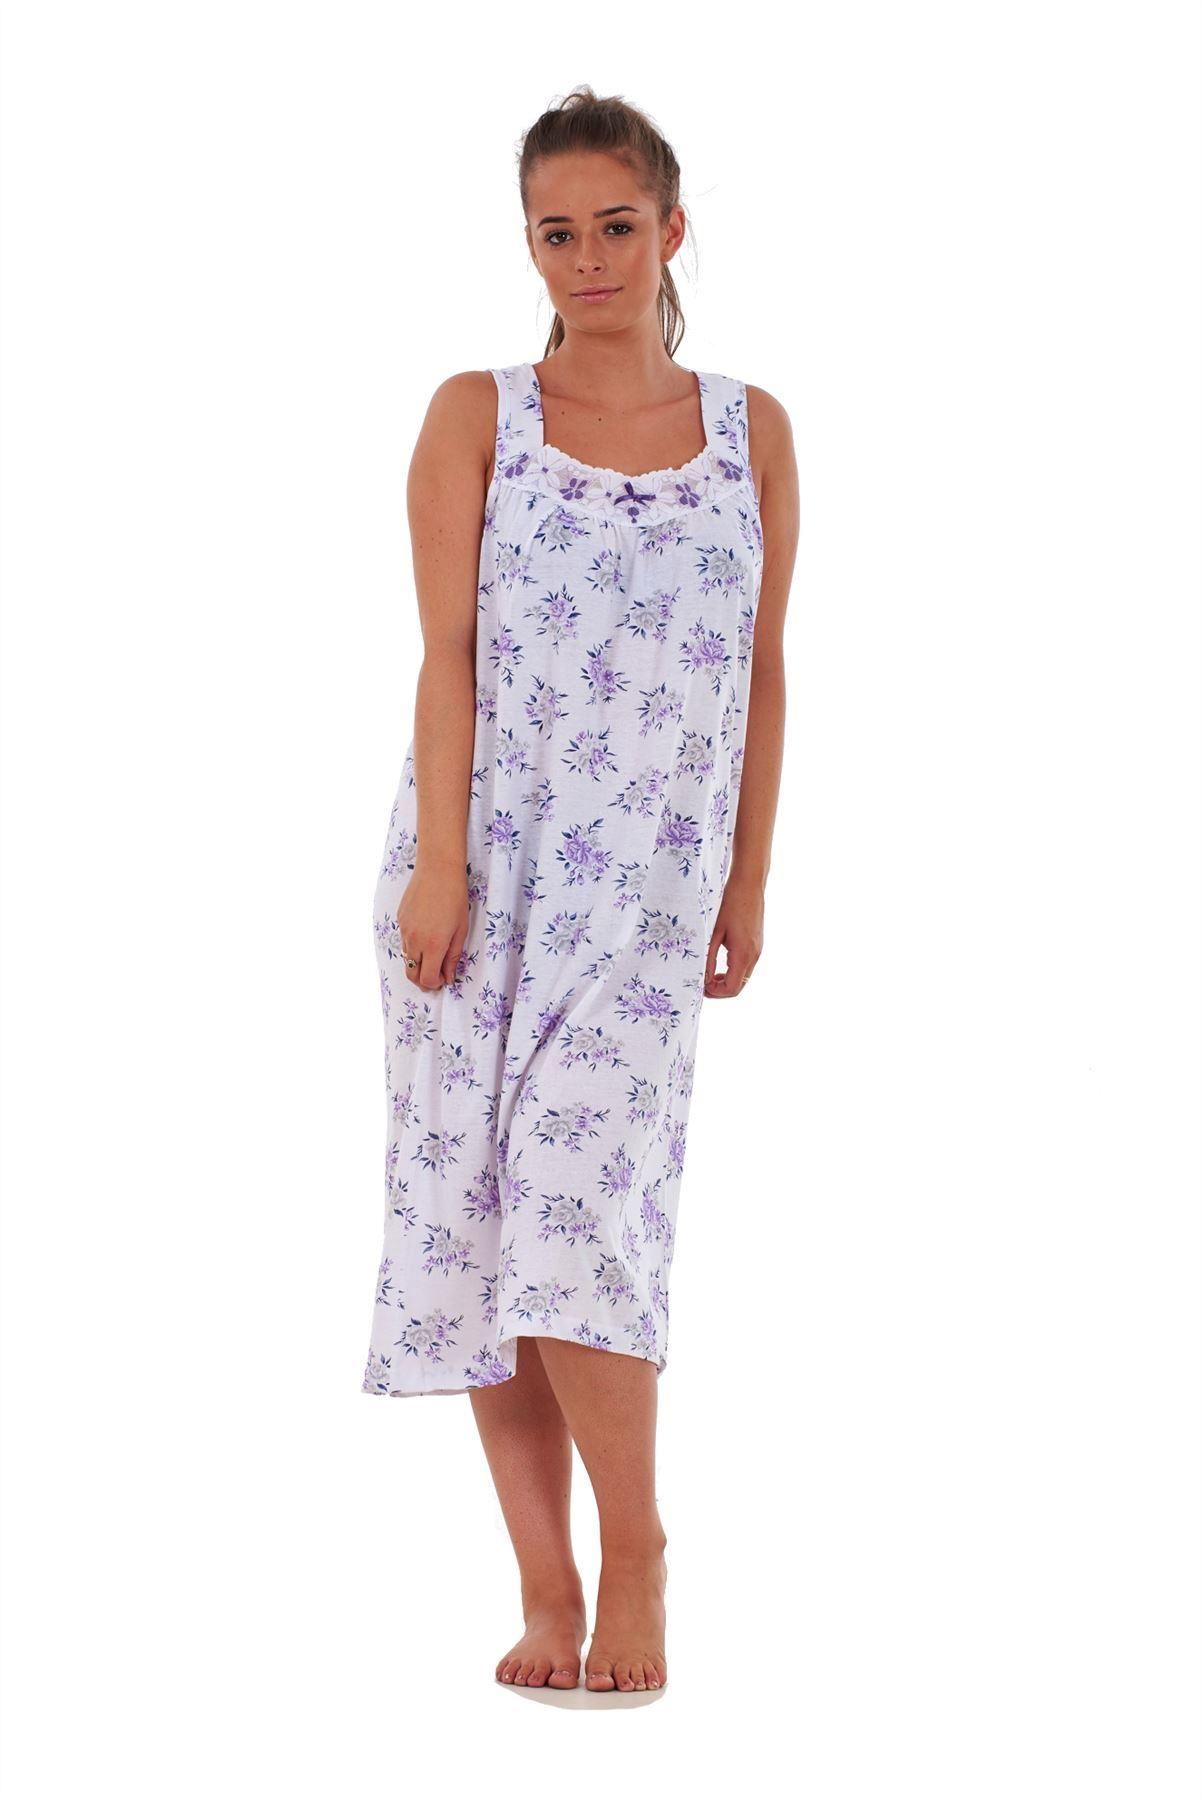 dece74ada1 Ladies Women Nightwear Rose Print 100% Cotton Sleeveless Long ...